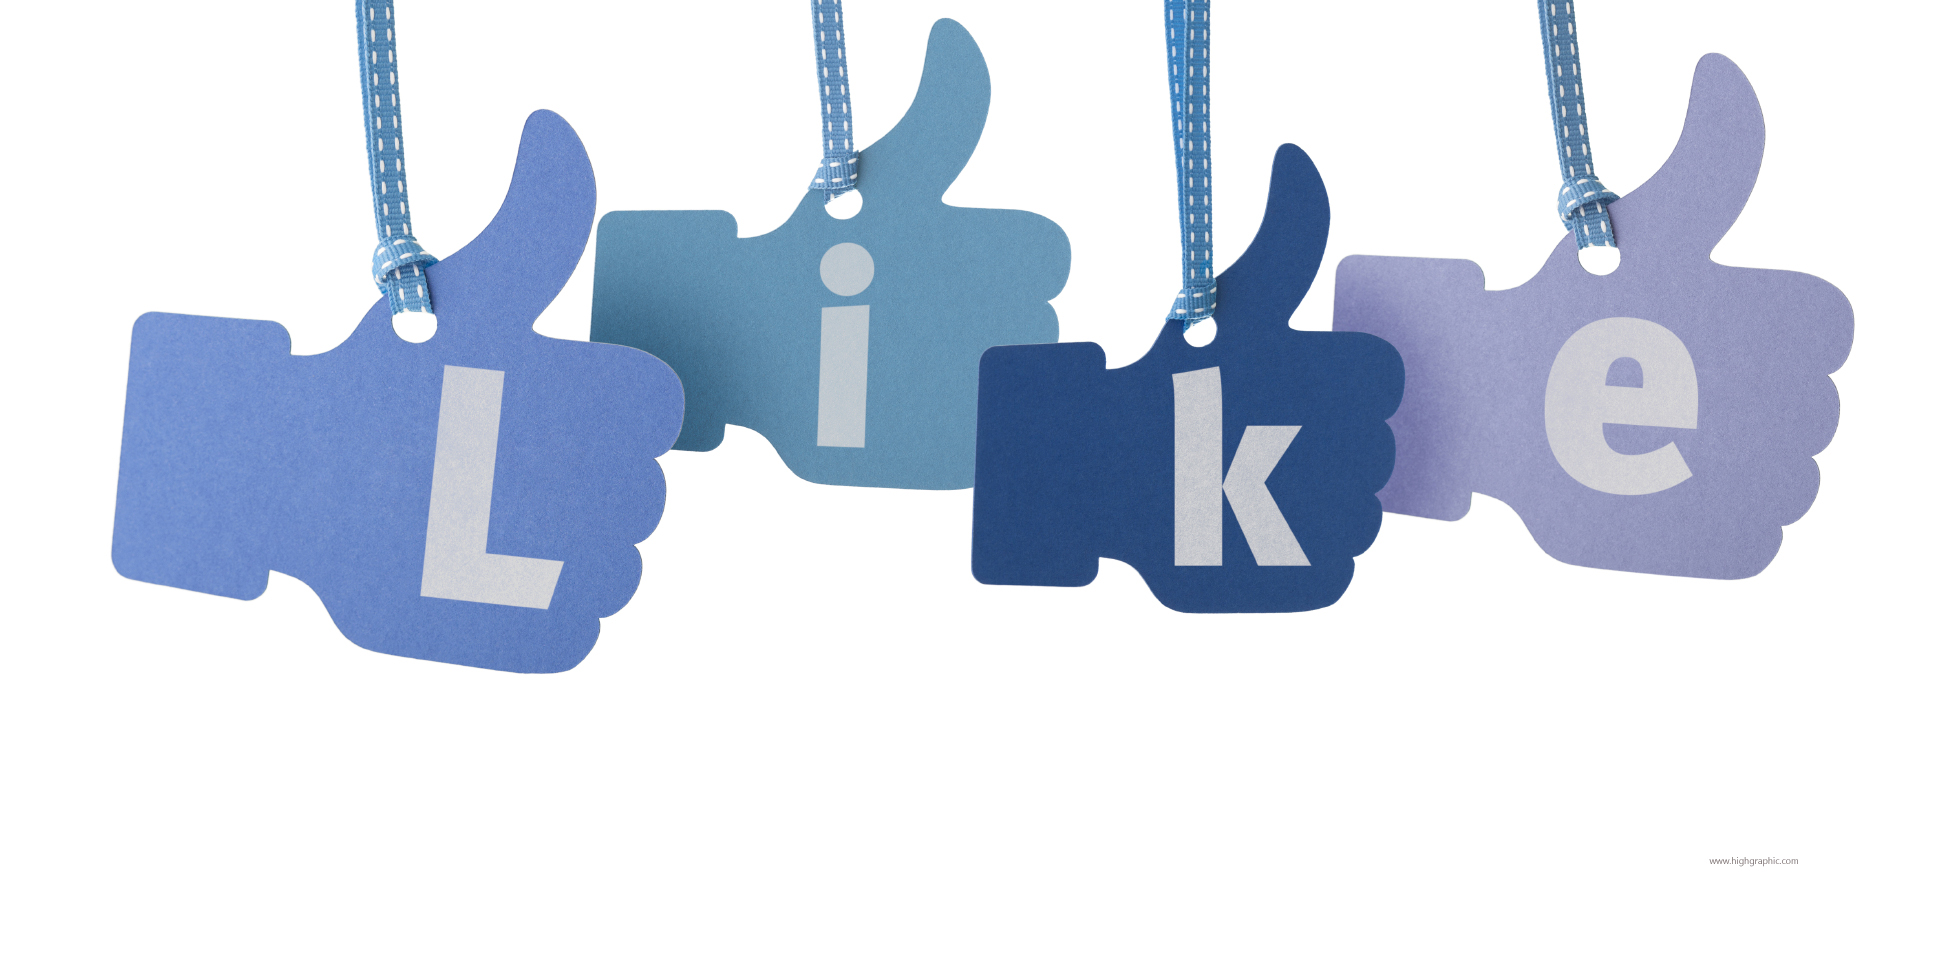 facebook 2017 trends like social